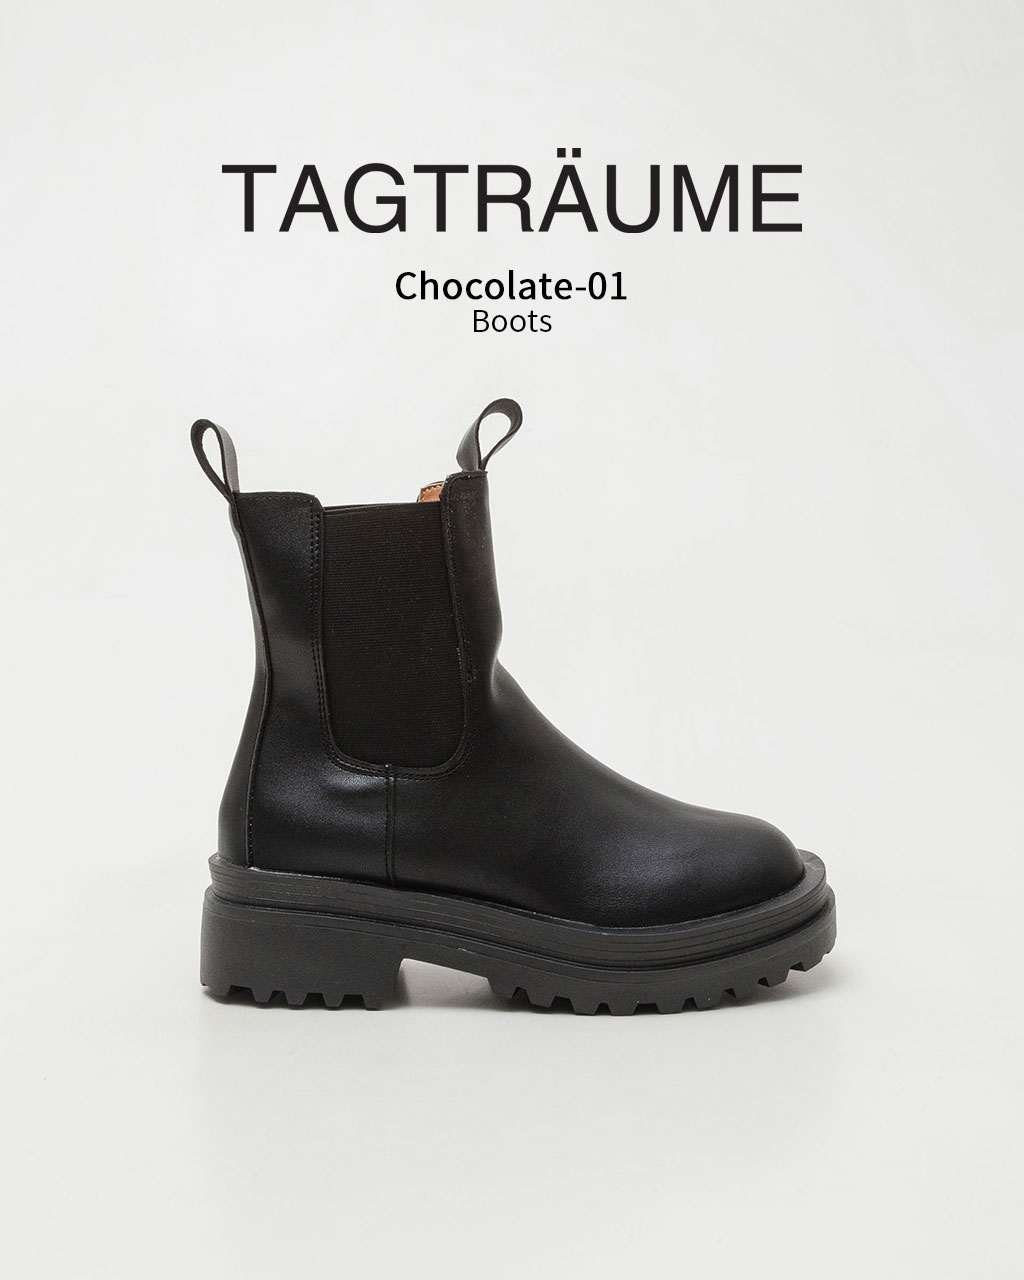 Tagtraume Chocolate-01 - Black(블랙)